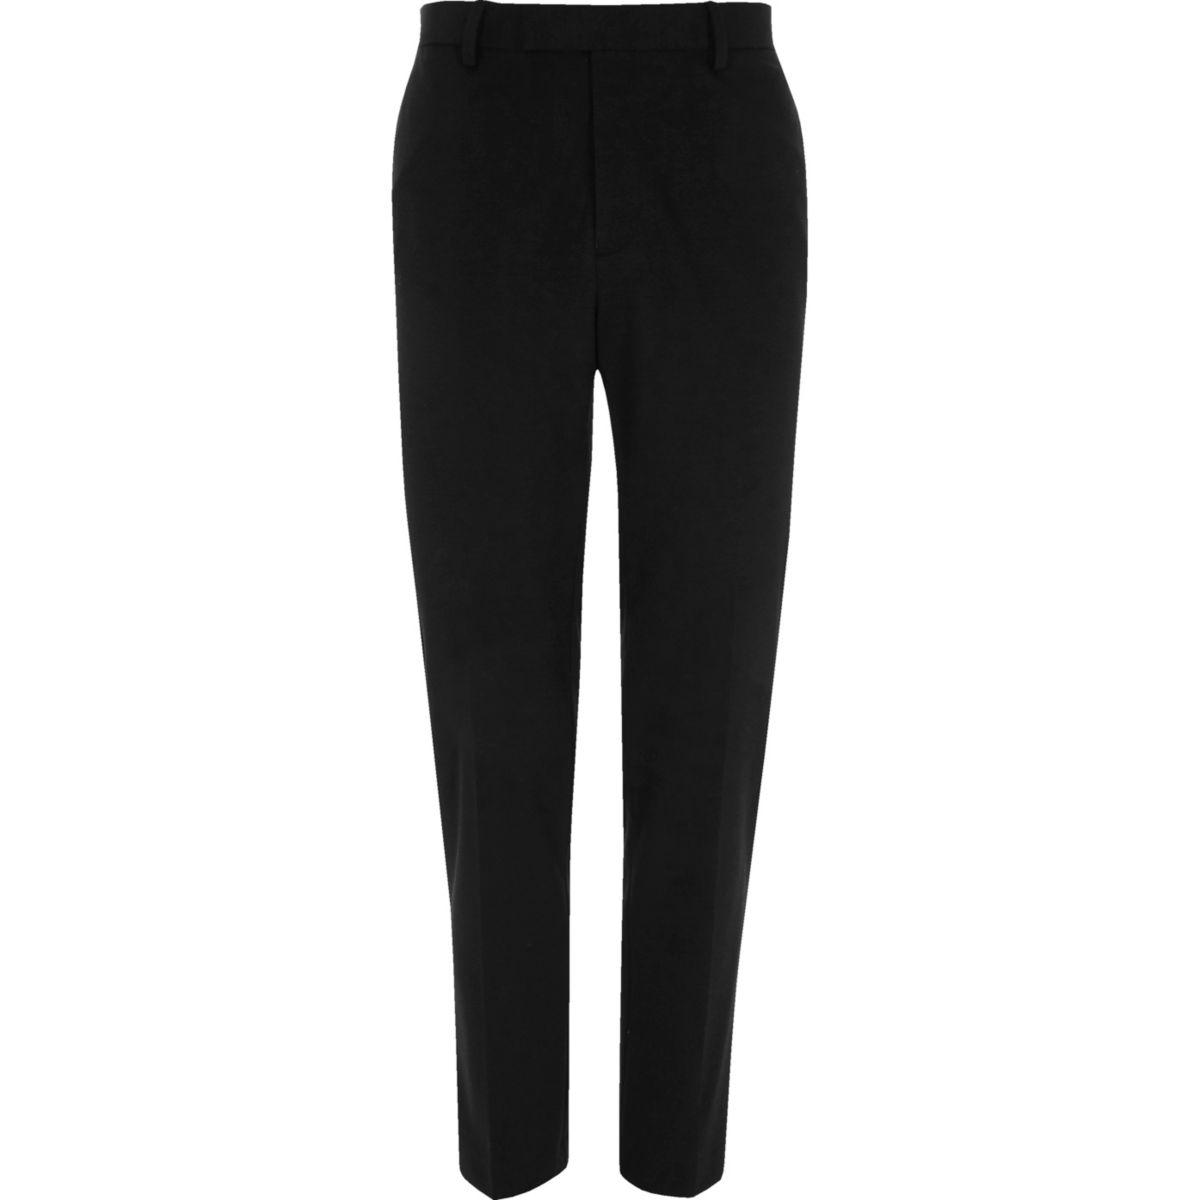 Black jersey skinny fit pants